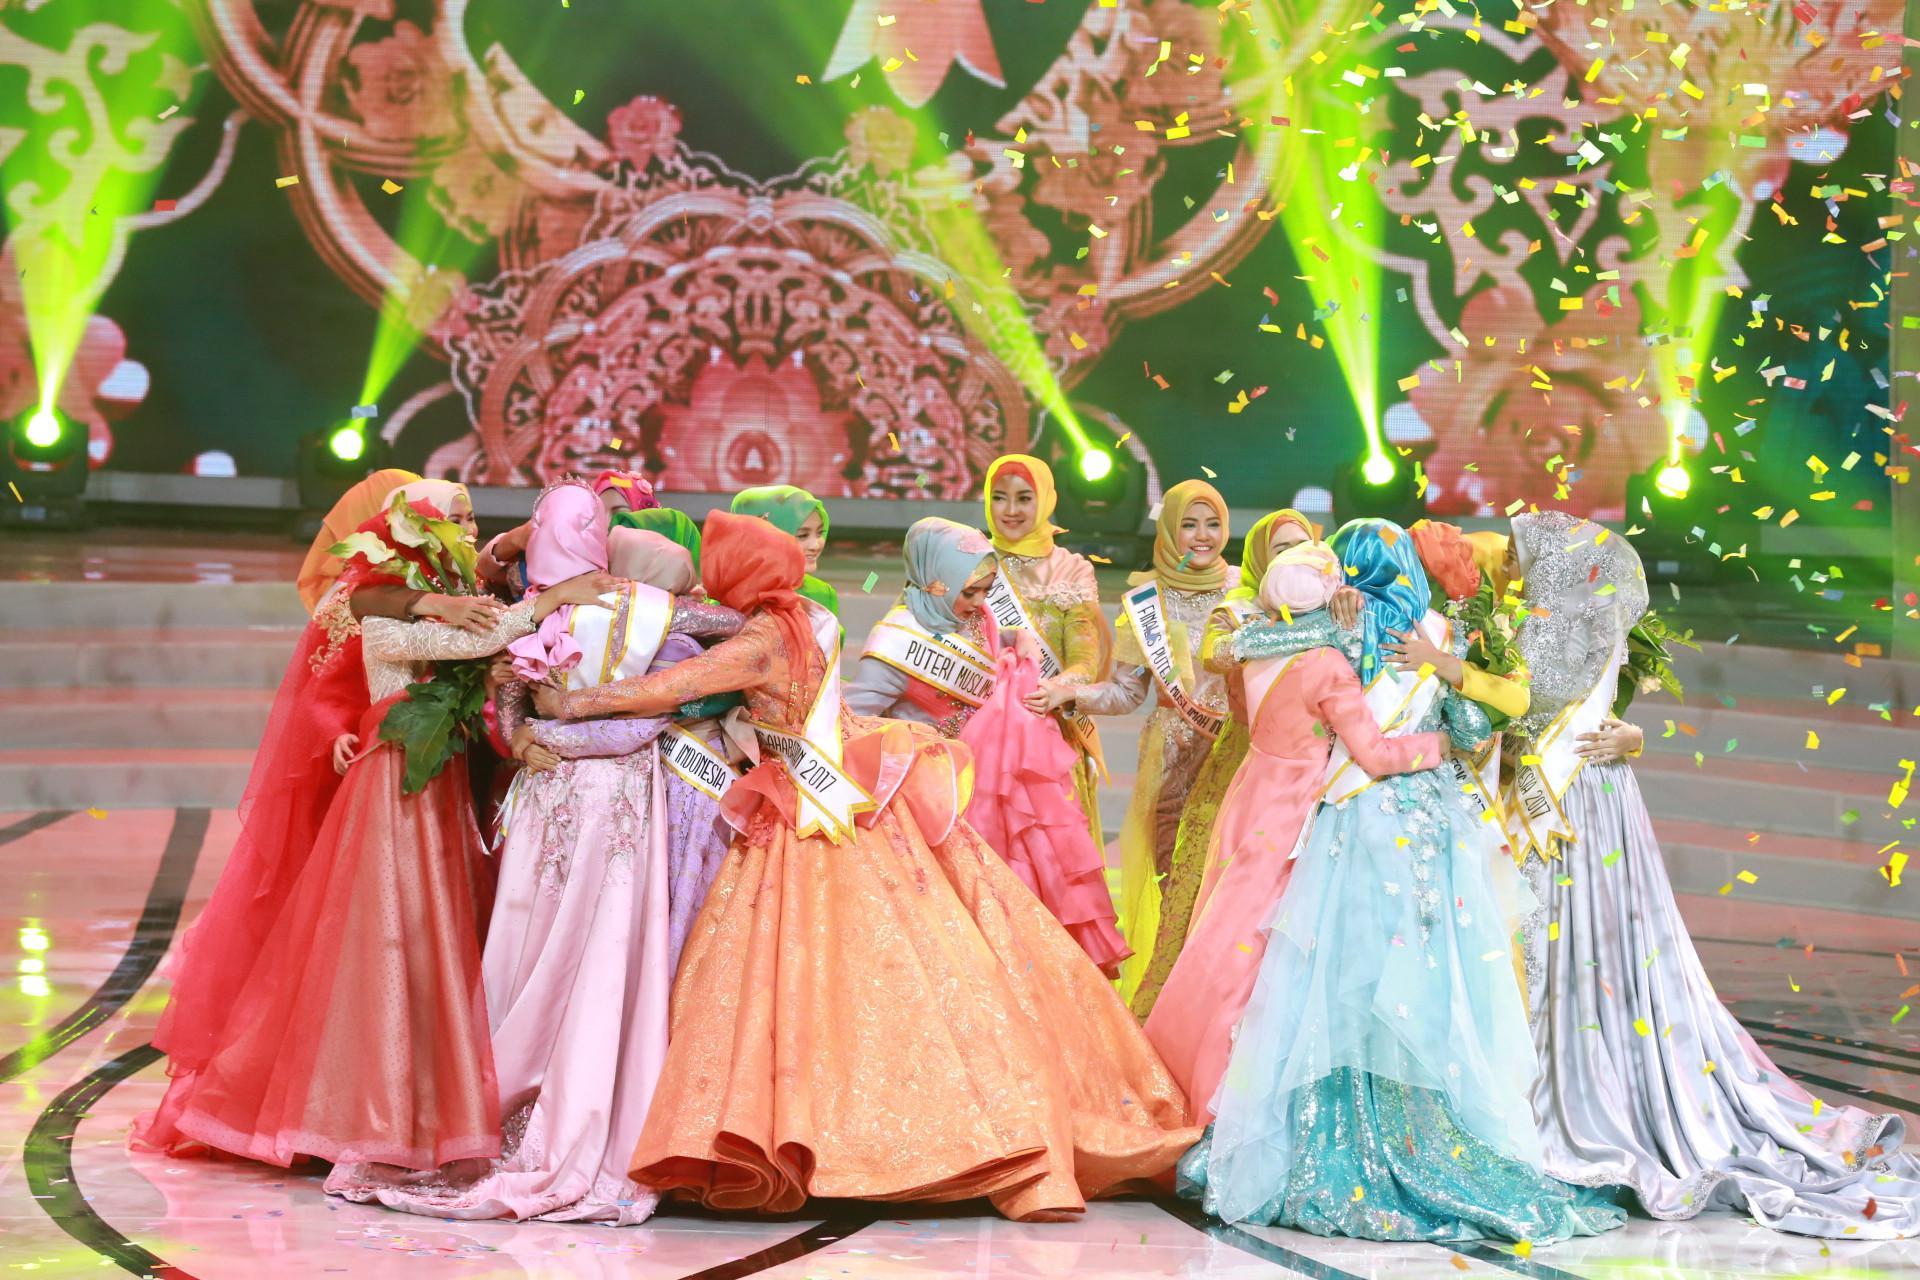 Suasana panggung final berubah diwarnai haru biru bahagia ketika nama Syifa Fatimah dinobatkan sebagai penemang. Syifa pun mendapat sambutan luar biasa dari para finalis lainnya yang langsung memeluknya saat itu. (Adrian Putra/Bintang.com)